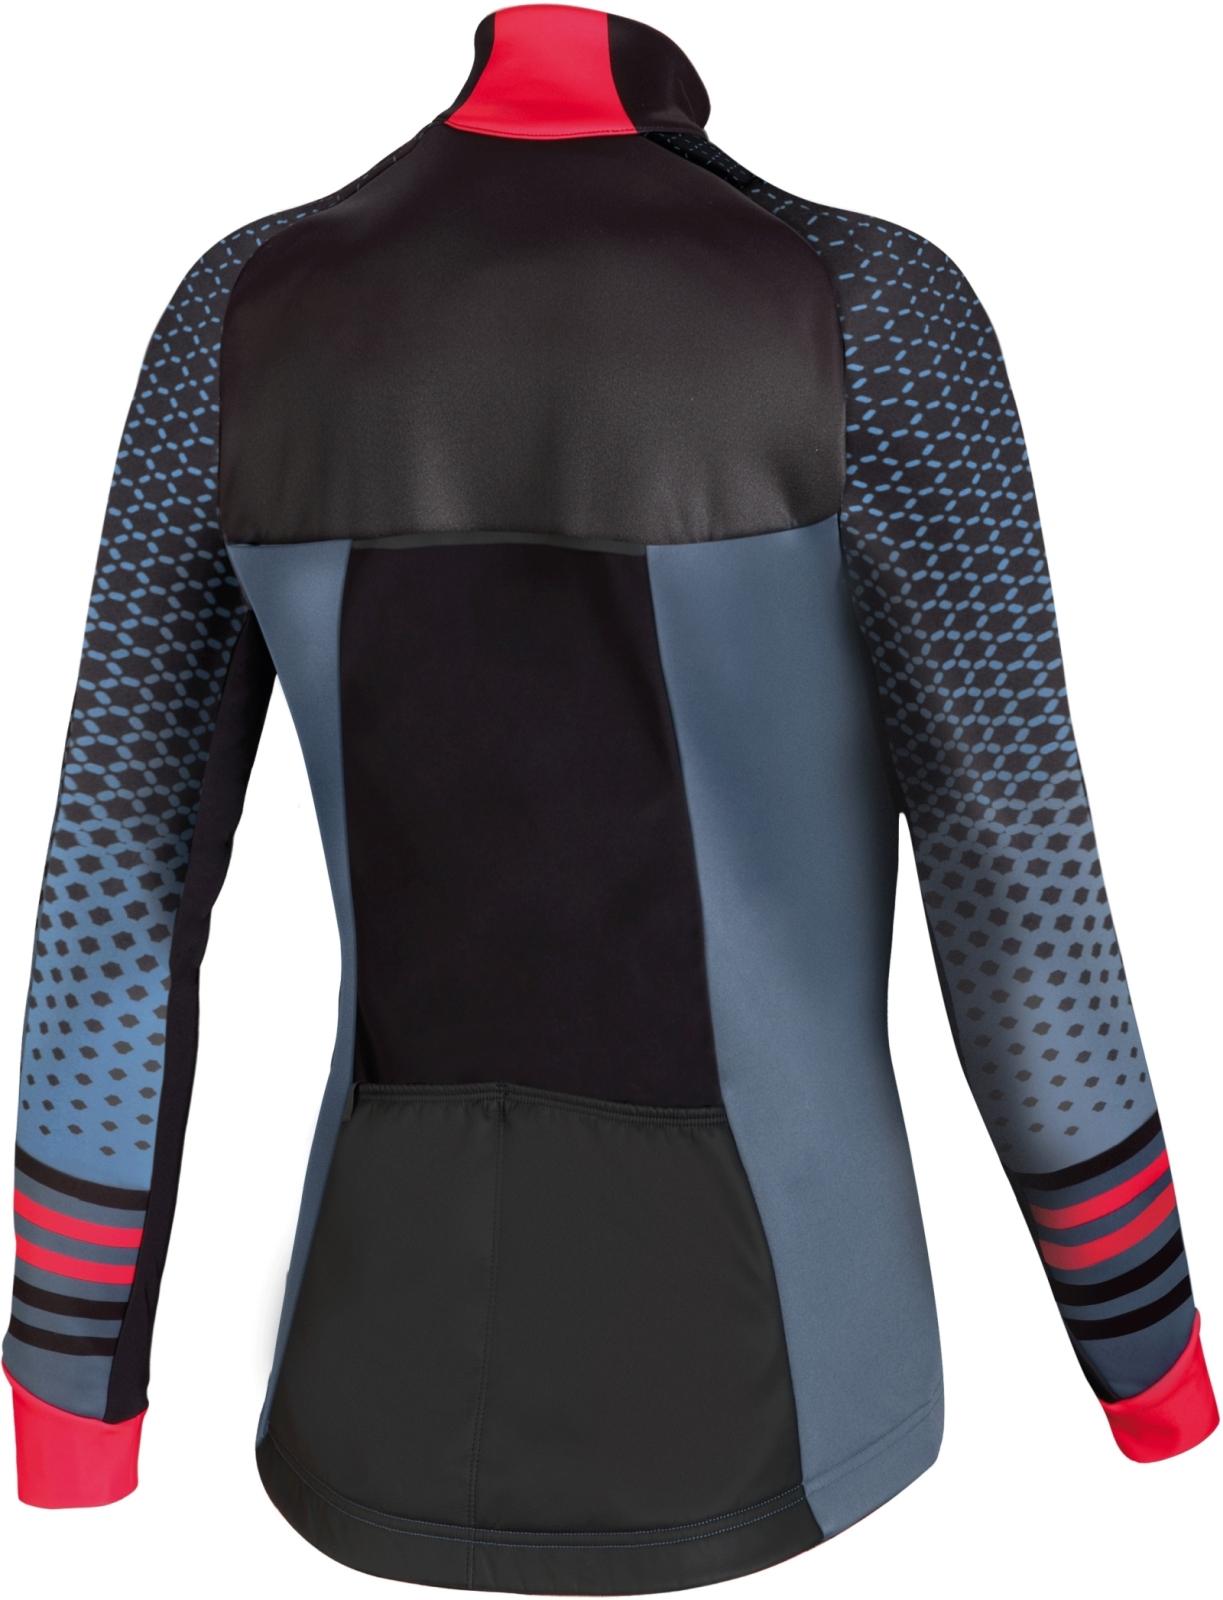 f08ae2471 Dámská cyklistická bunda Specialized Element Rbx Comp Wmn Jacket - dust  blue/acid red